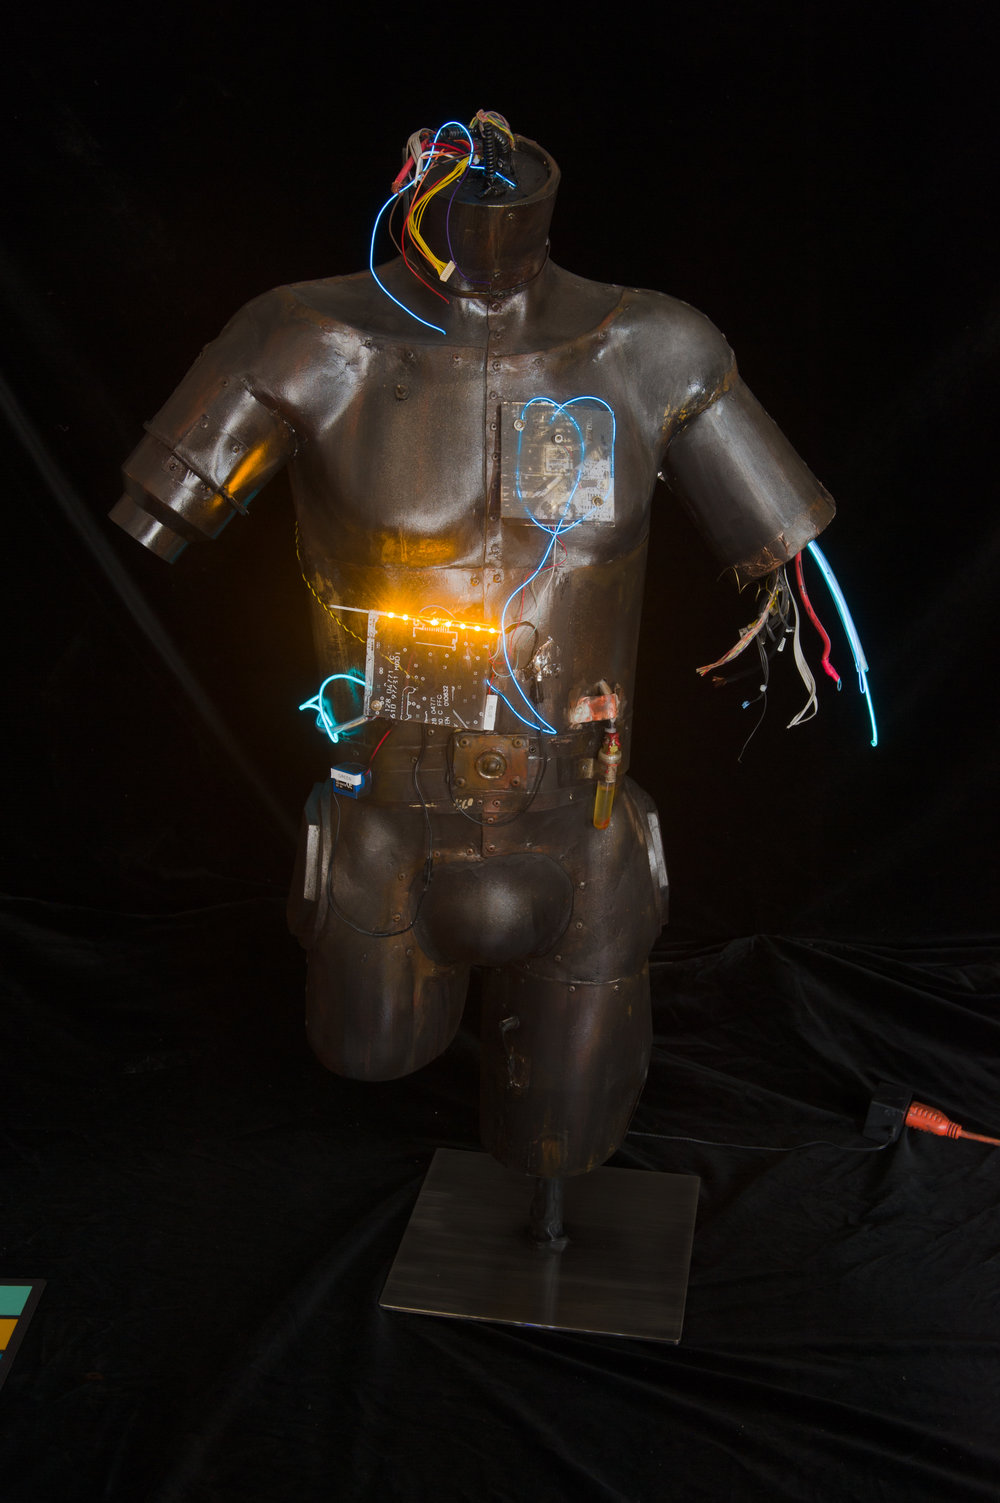 Pneumatic Man - Reclaimed torso, cool lites, microprocessor